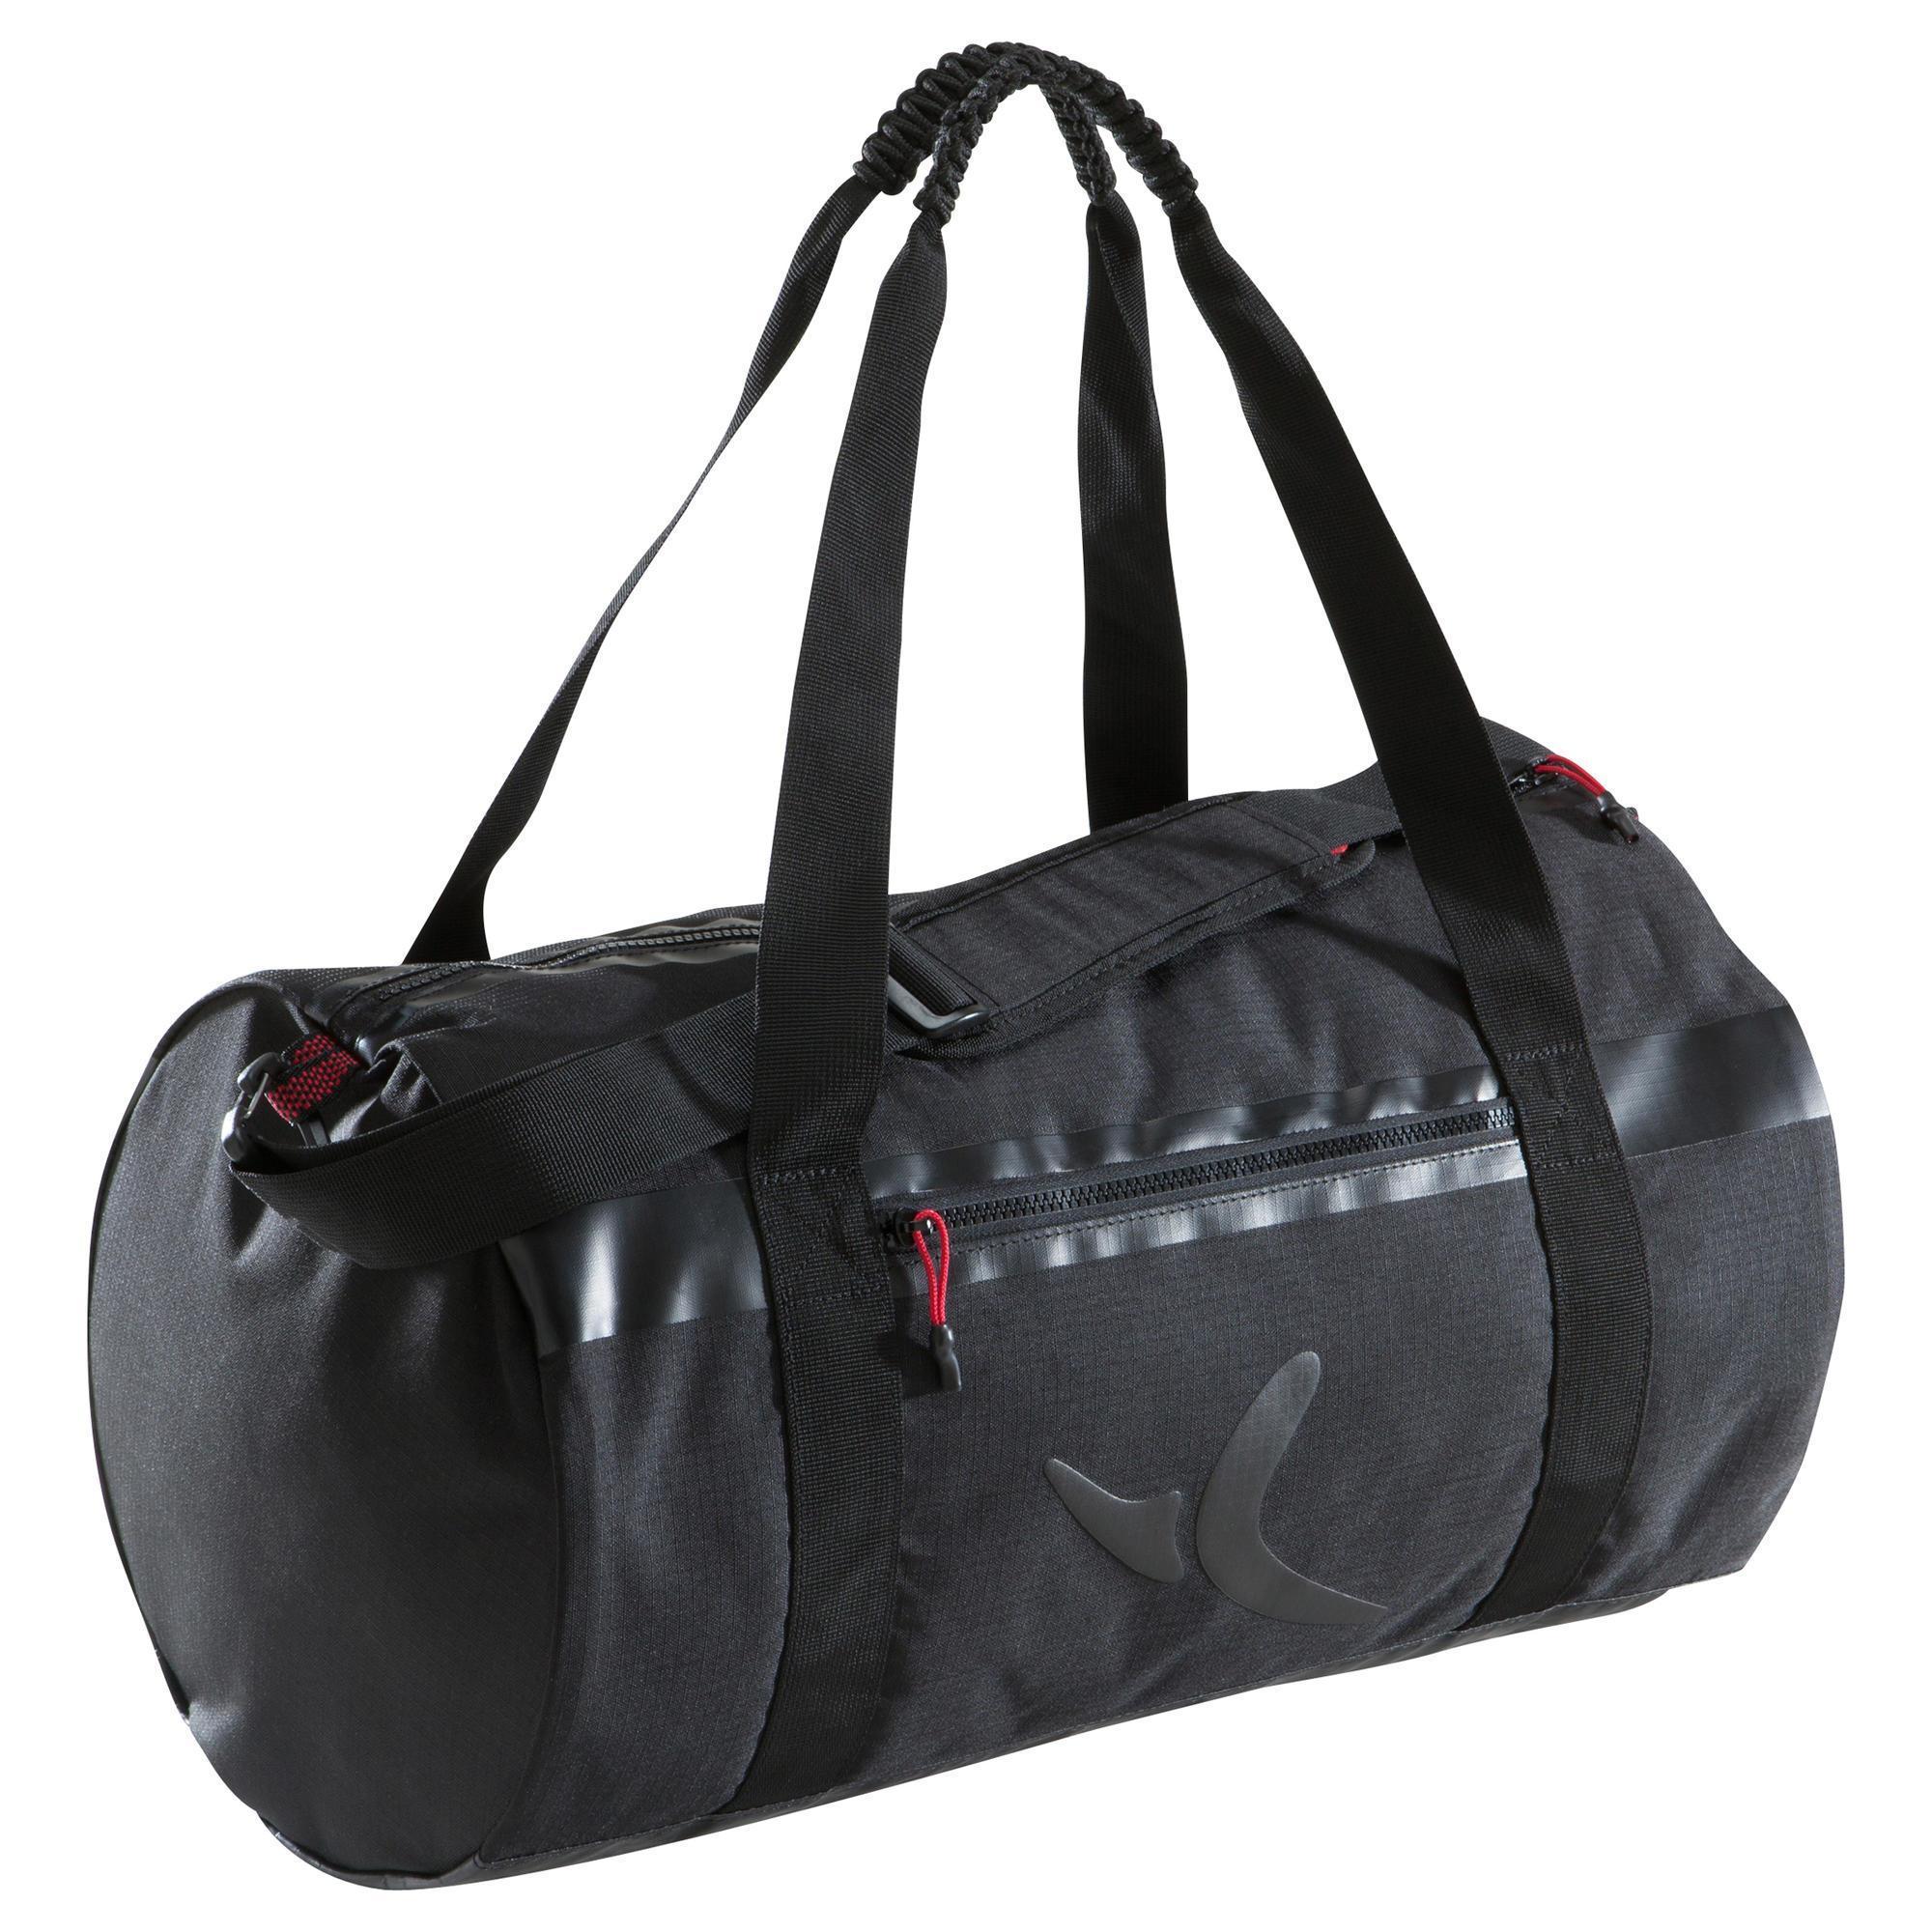 sac fitness noir feel strong m domyos by decathlon. Black Bedroom Furniture Sets. Home Design Ideas